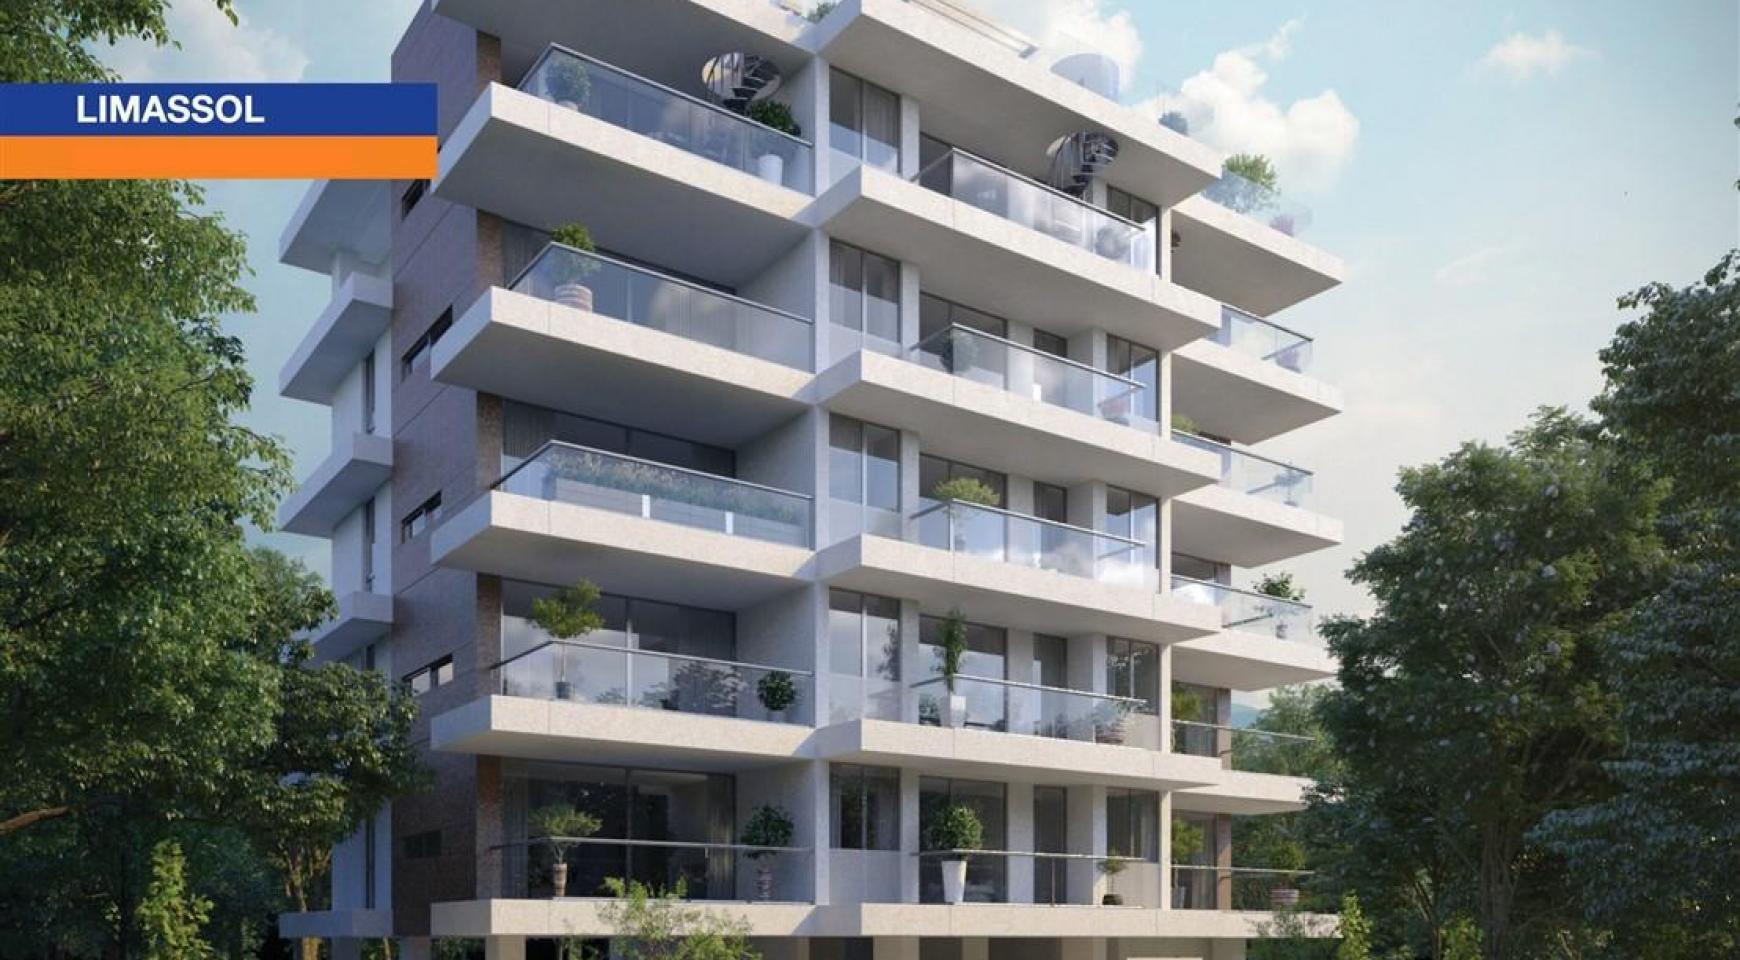 New Spacious One Bedroom Apartment in Neapolis Area - 1